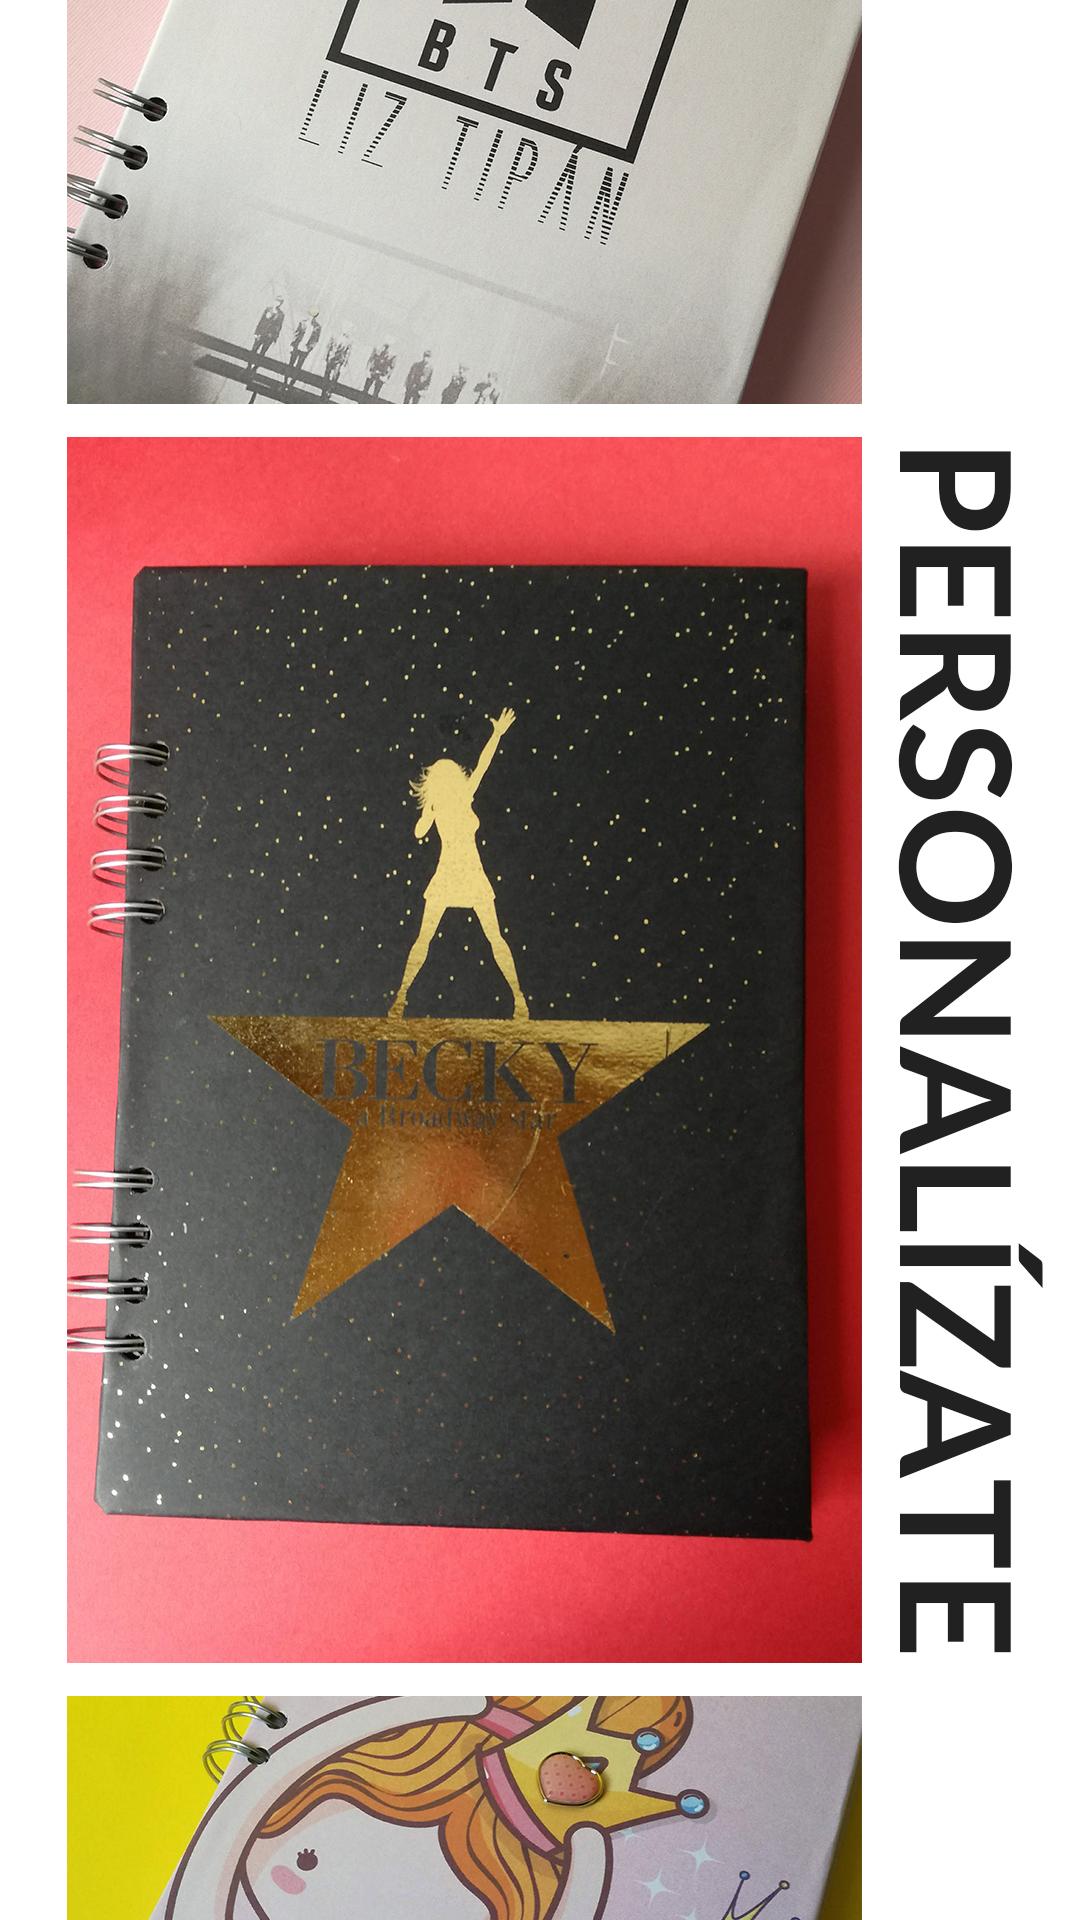 Personalízate